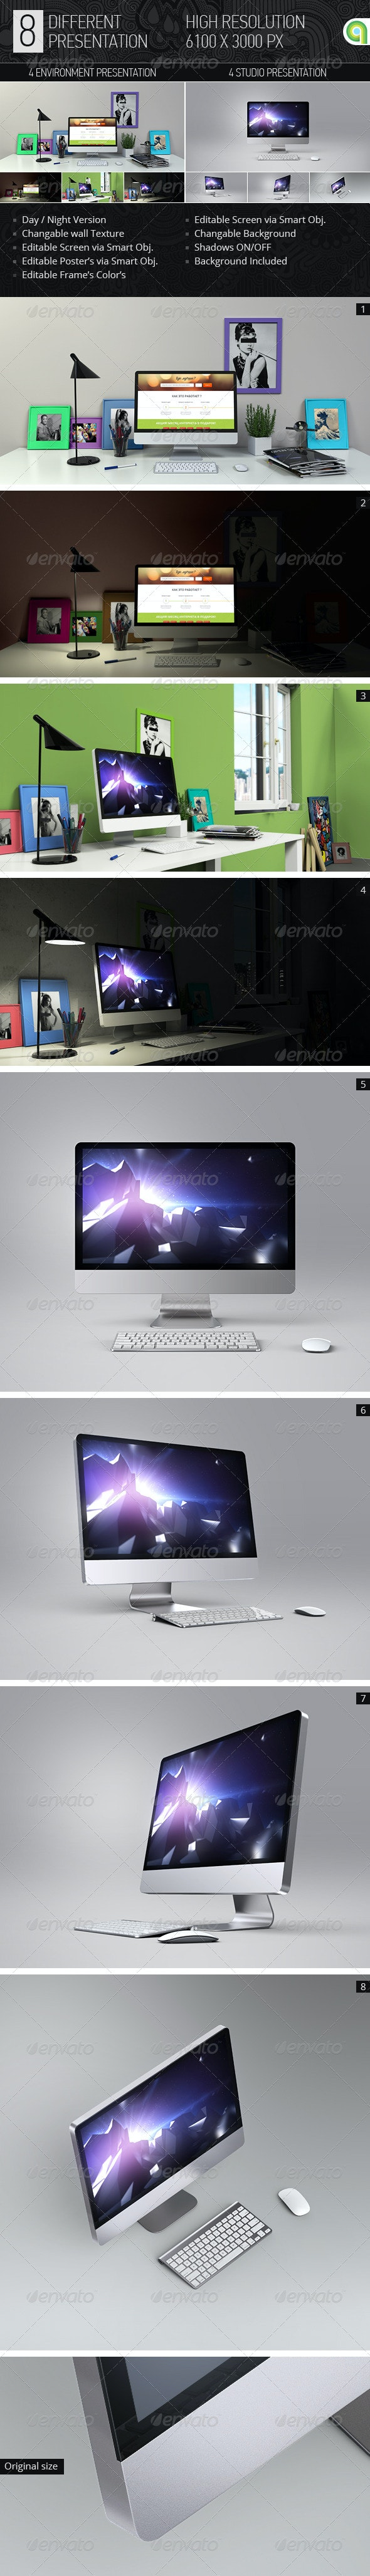 Desktop & Screen Mock-up  - Monitors Displays